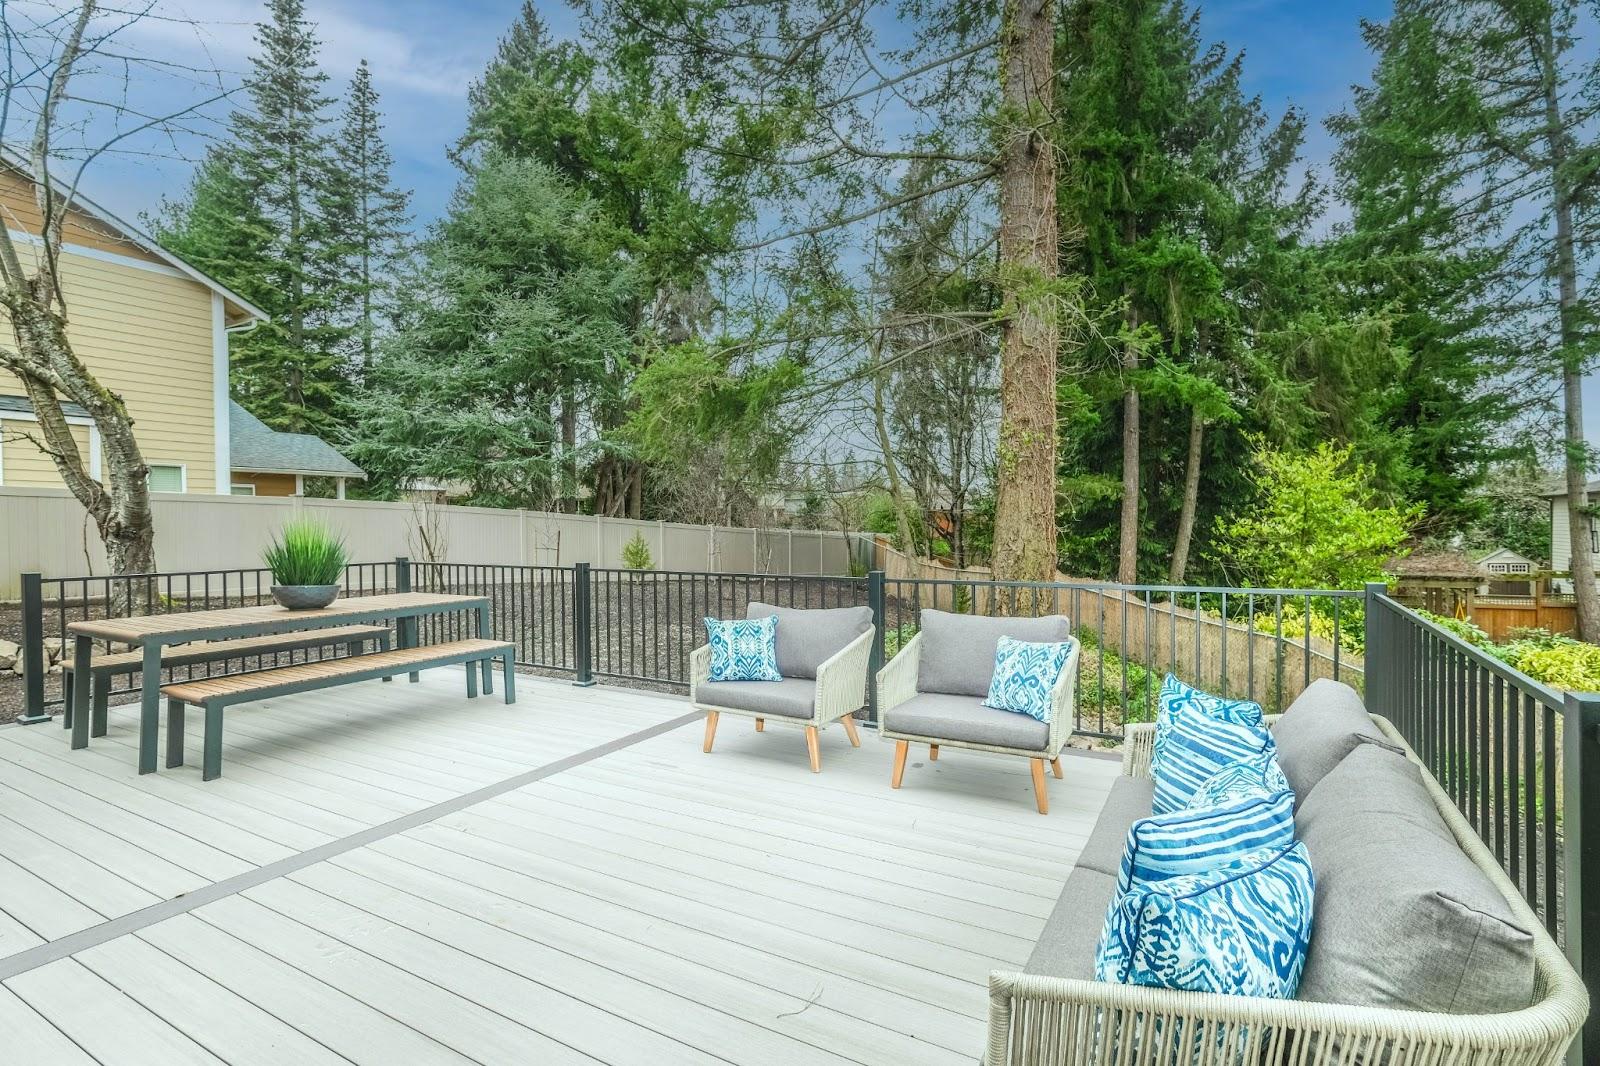 patio deck; modern outdoor furniture ideas